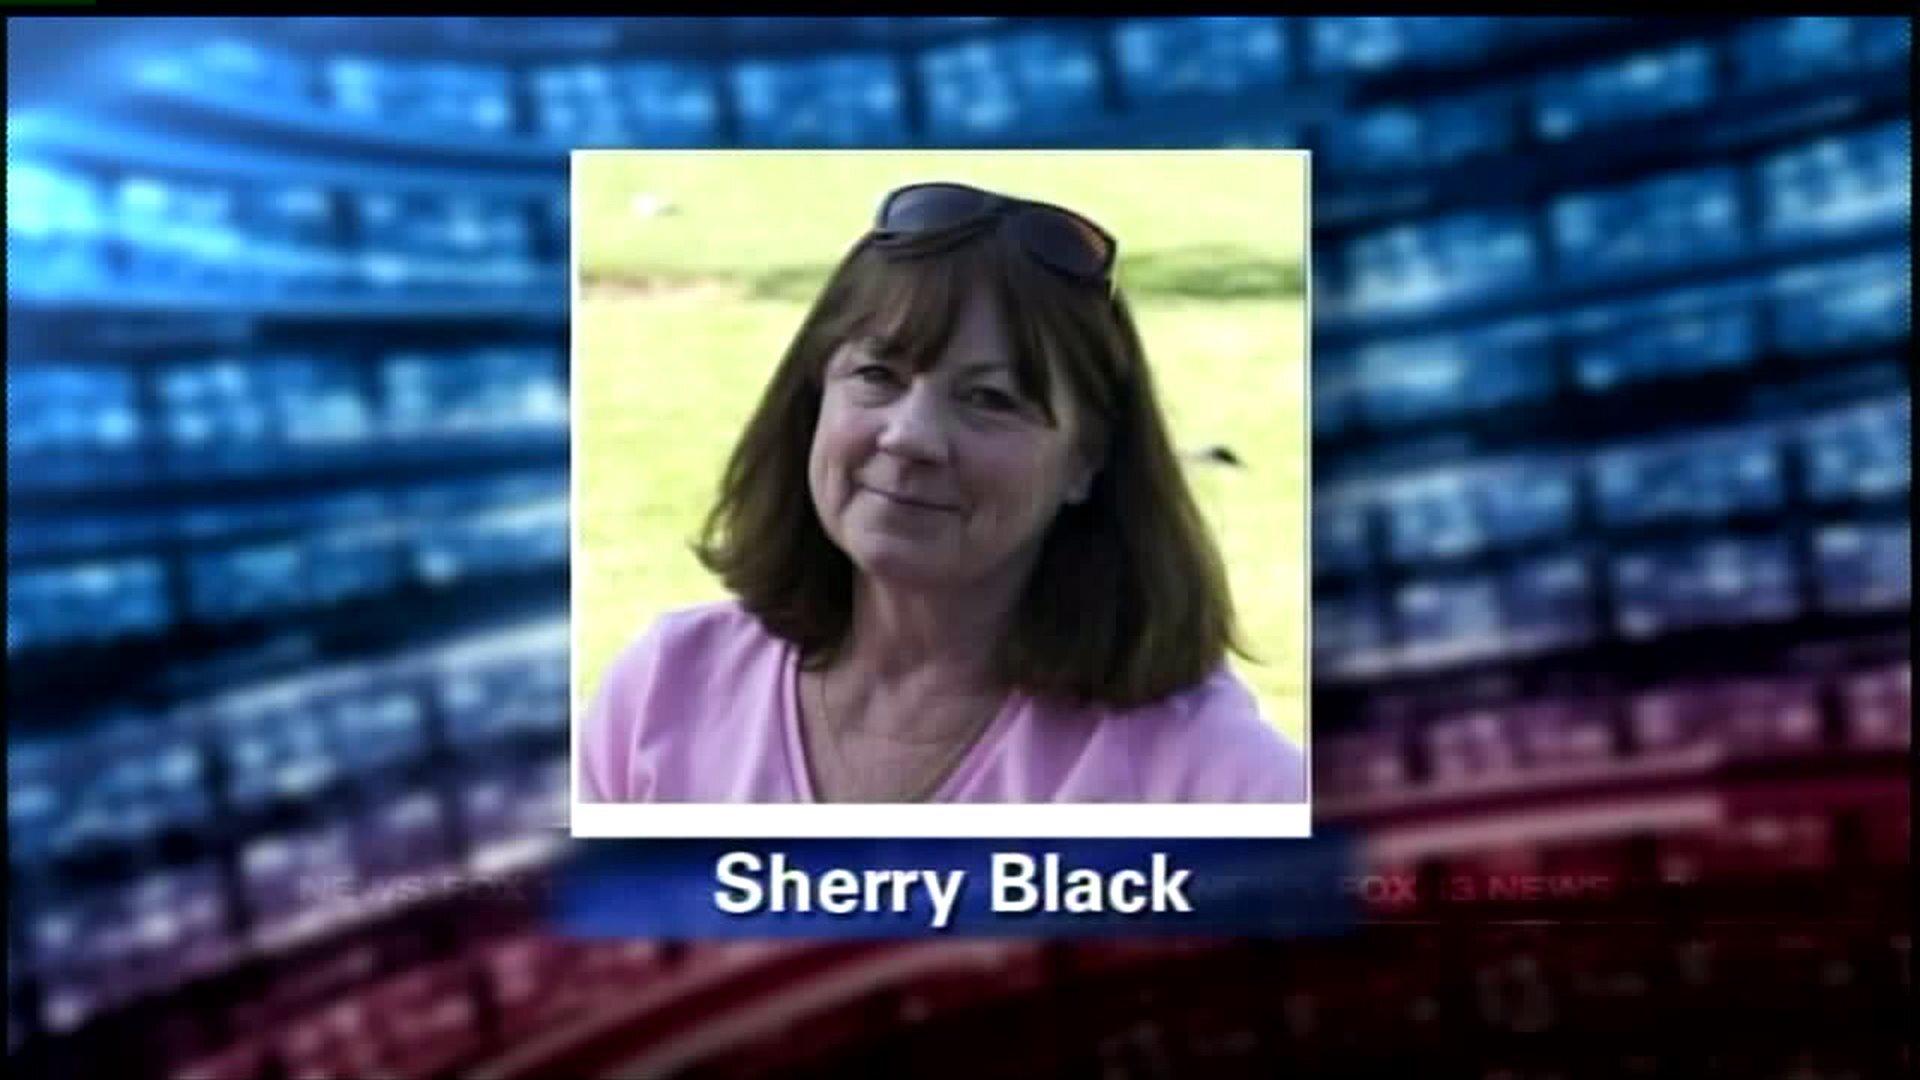 Photos: Suspect sketch released; reward in 2010 murder of Sherry Black increased to$250K